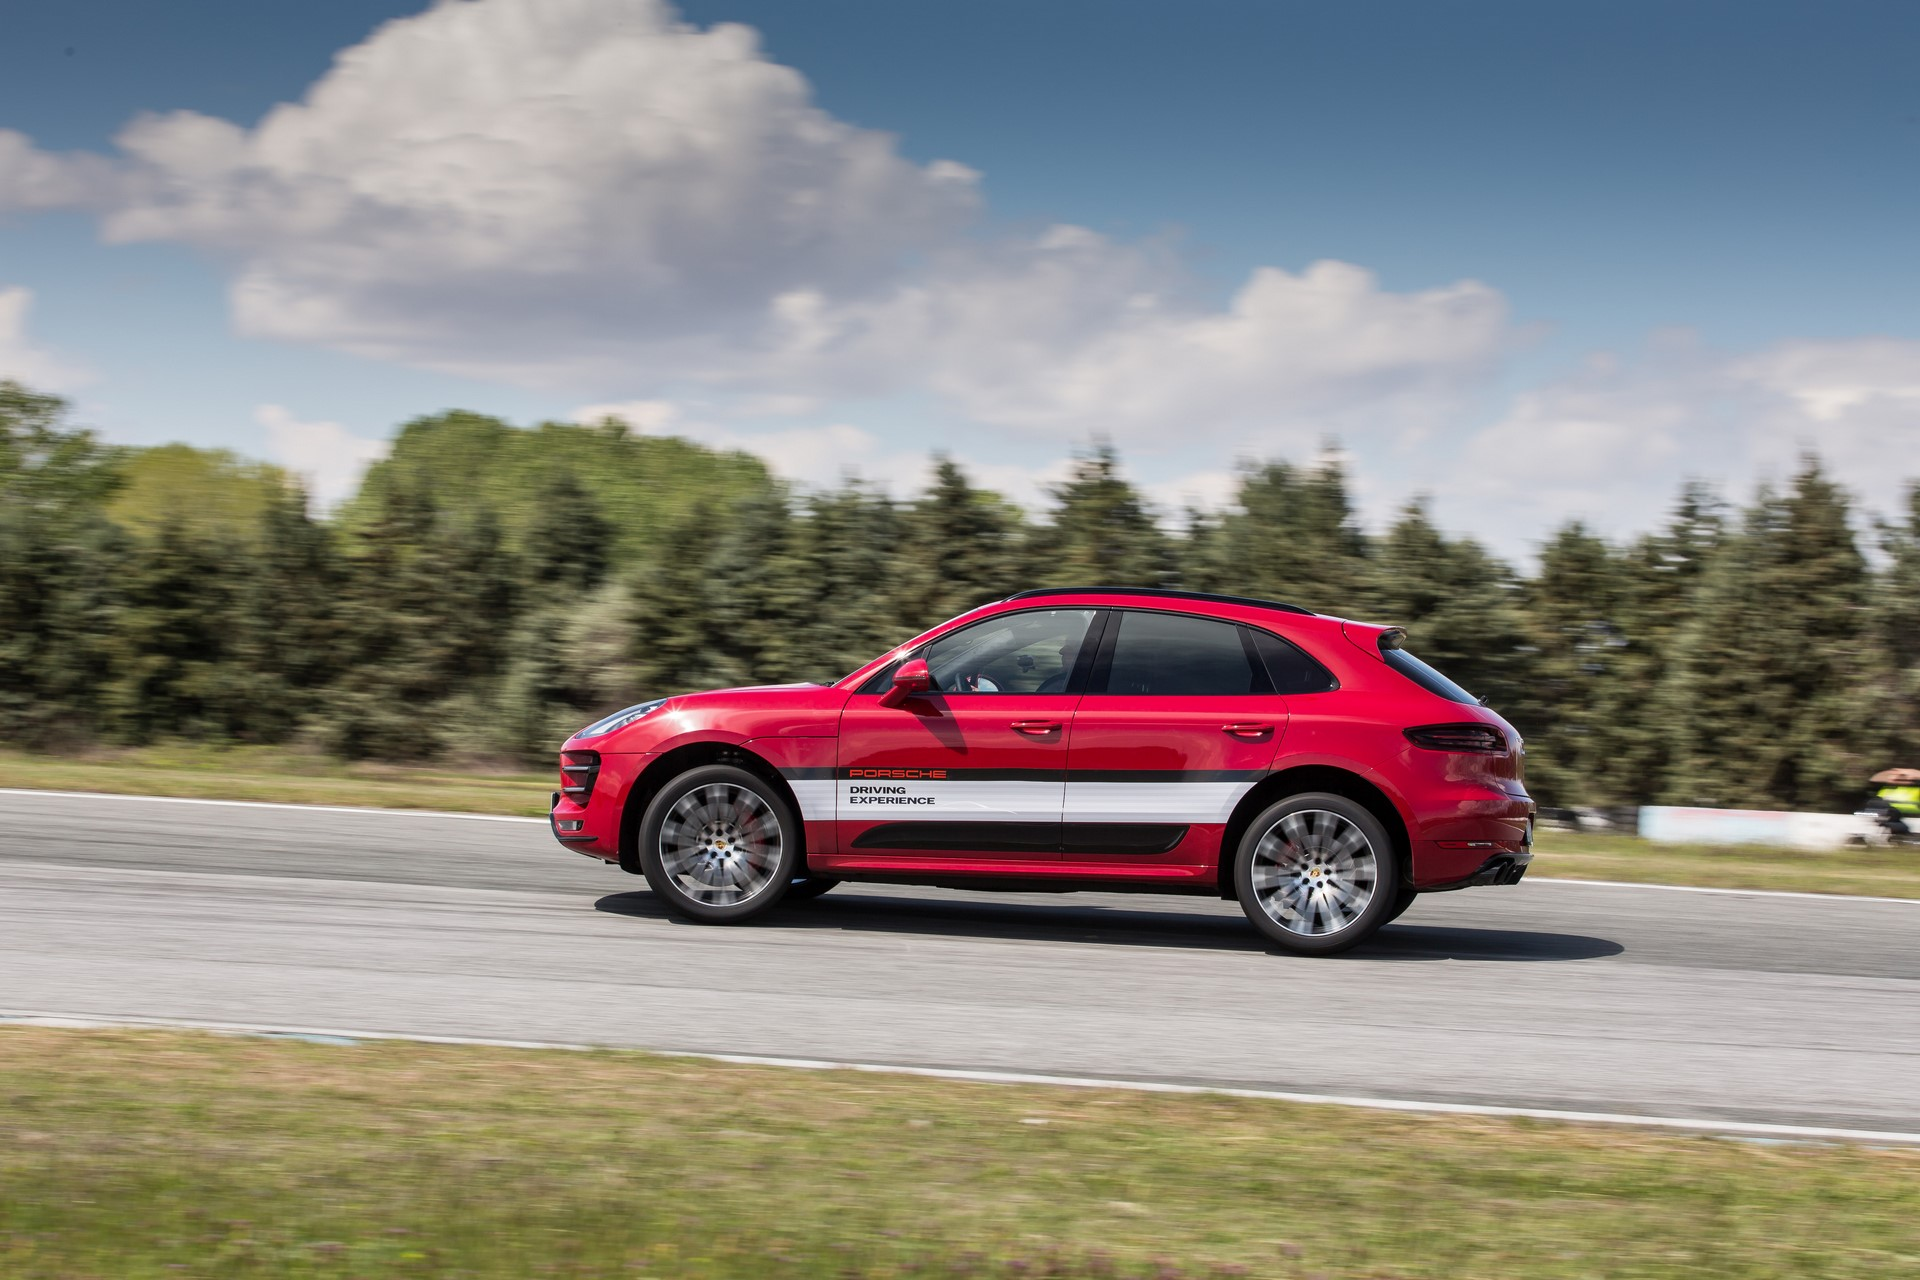 Porsche Driving Experience 2017 Serres (129)